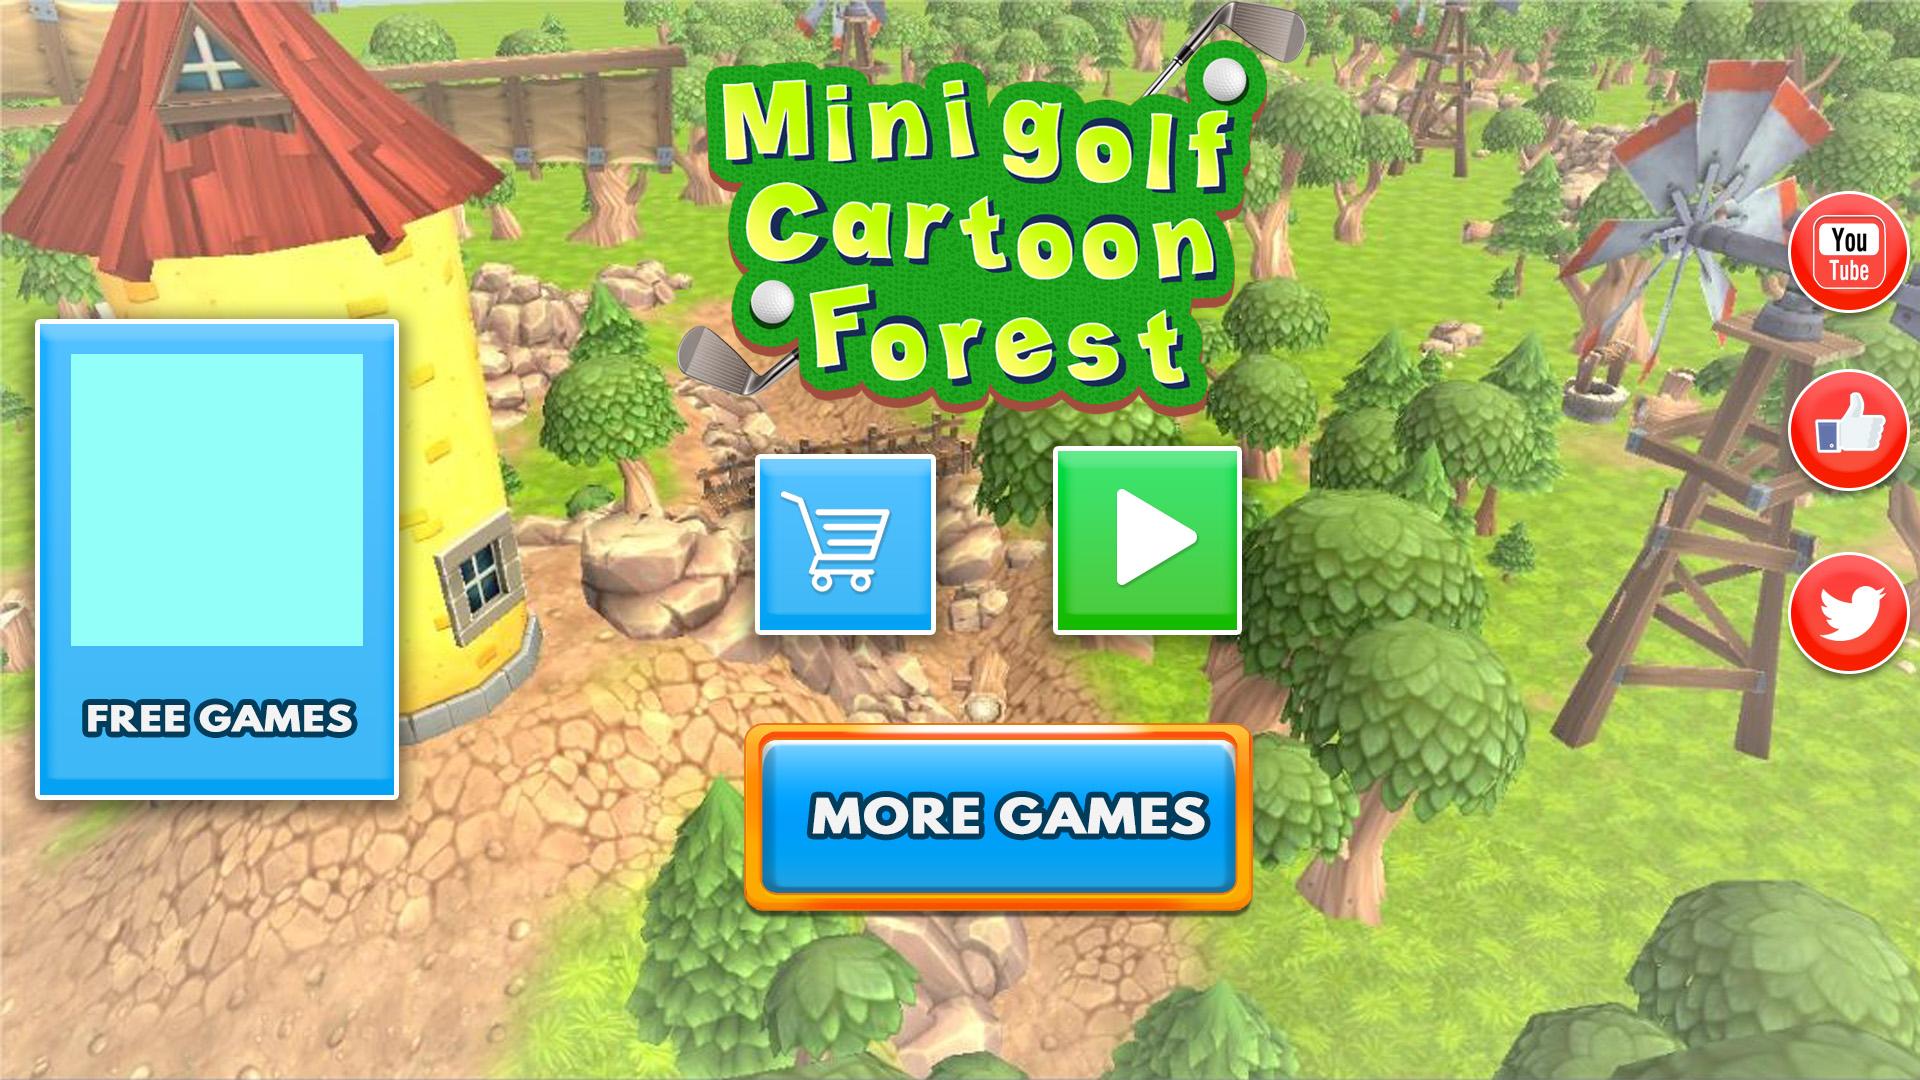 Cartoon style UI